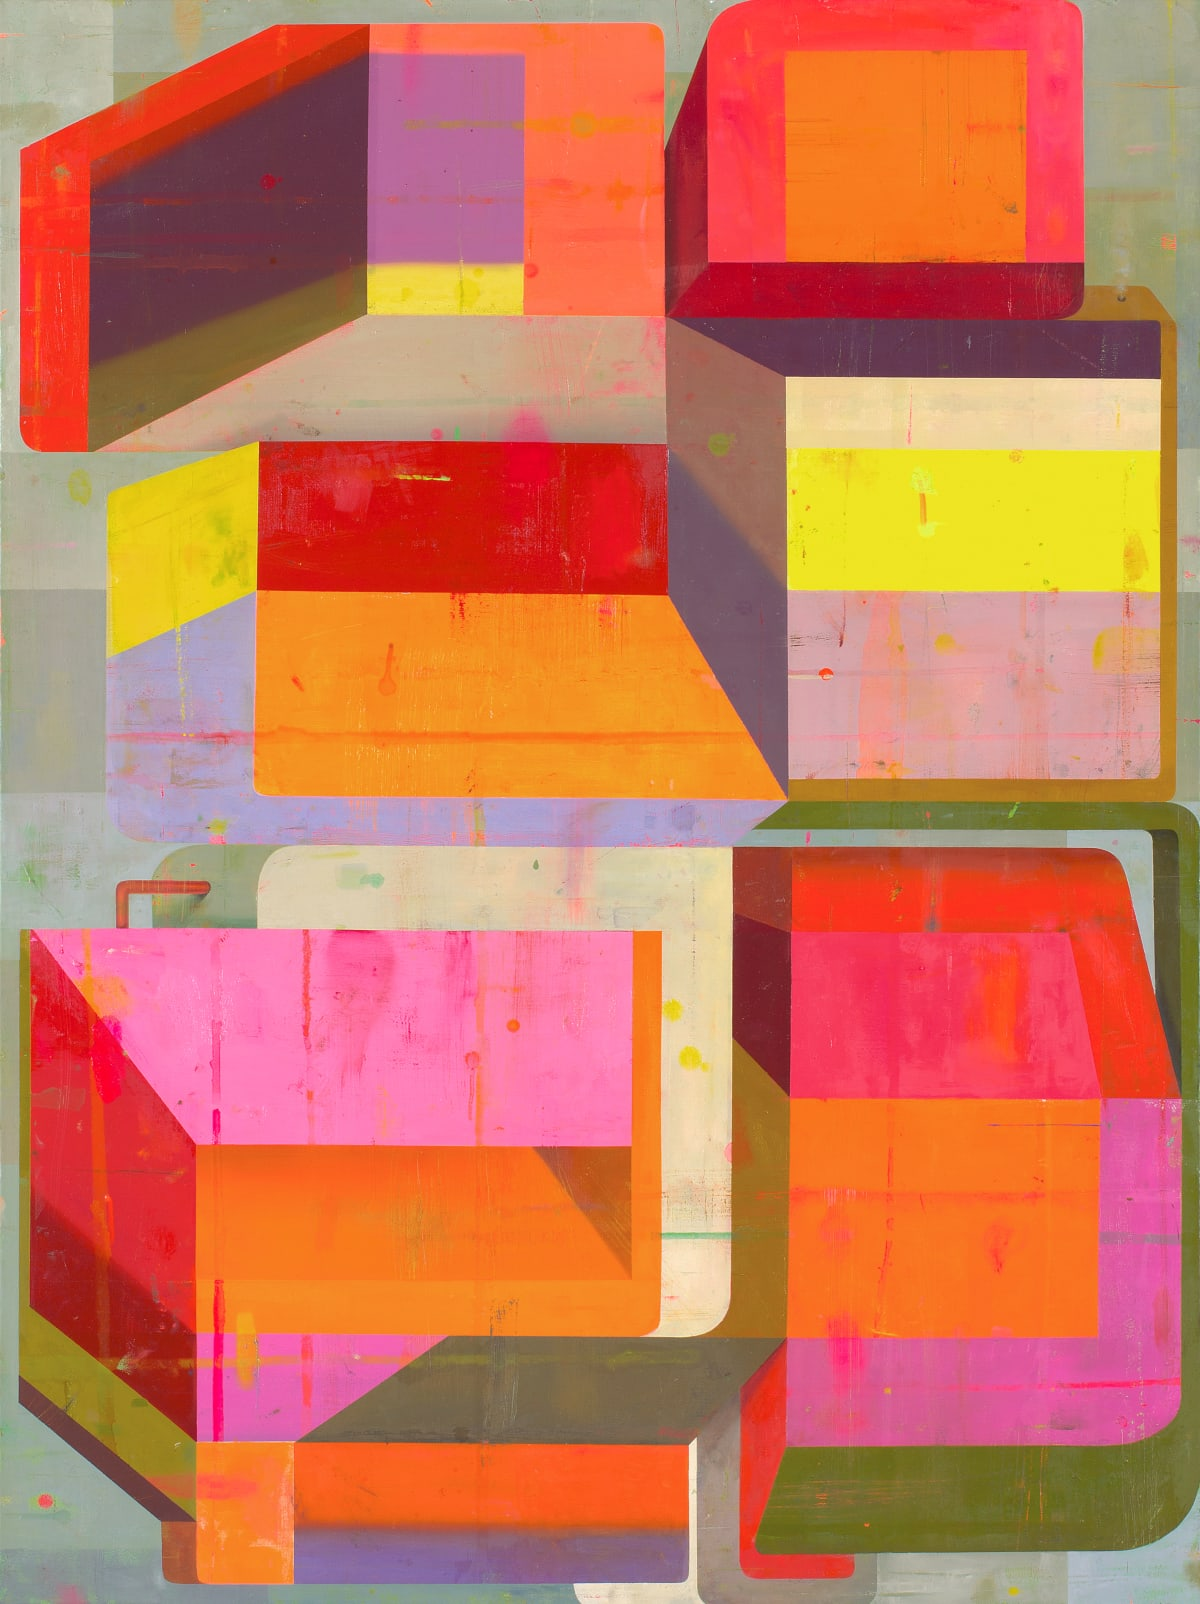 Deborah Zlotsky Detours and delays, 2019 oil on canvas 36 x 48 in.